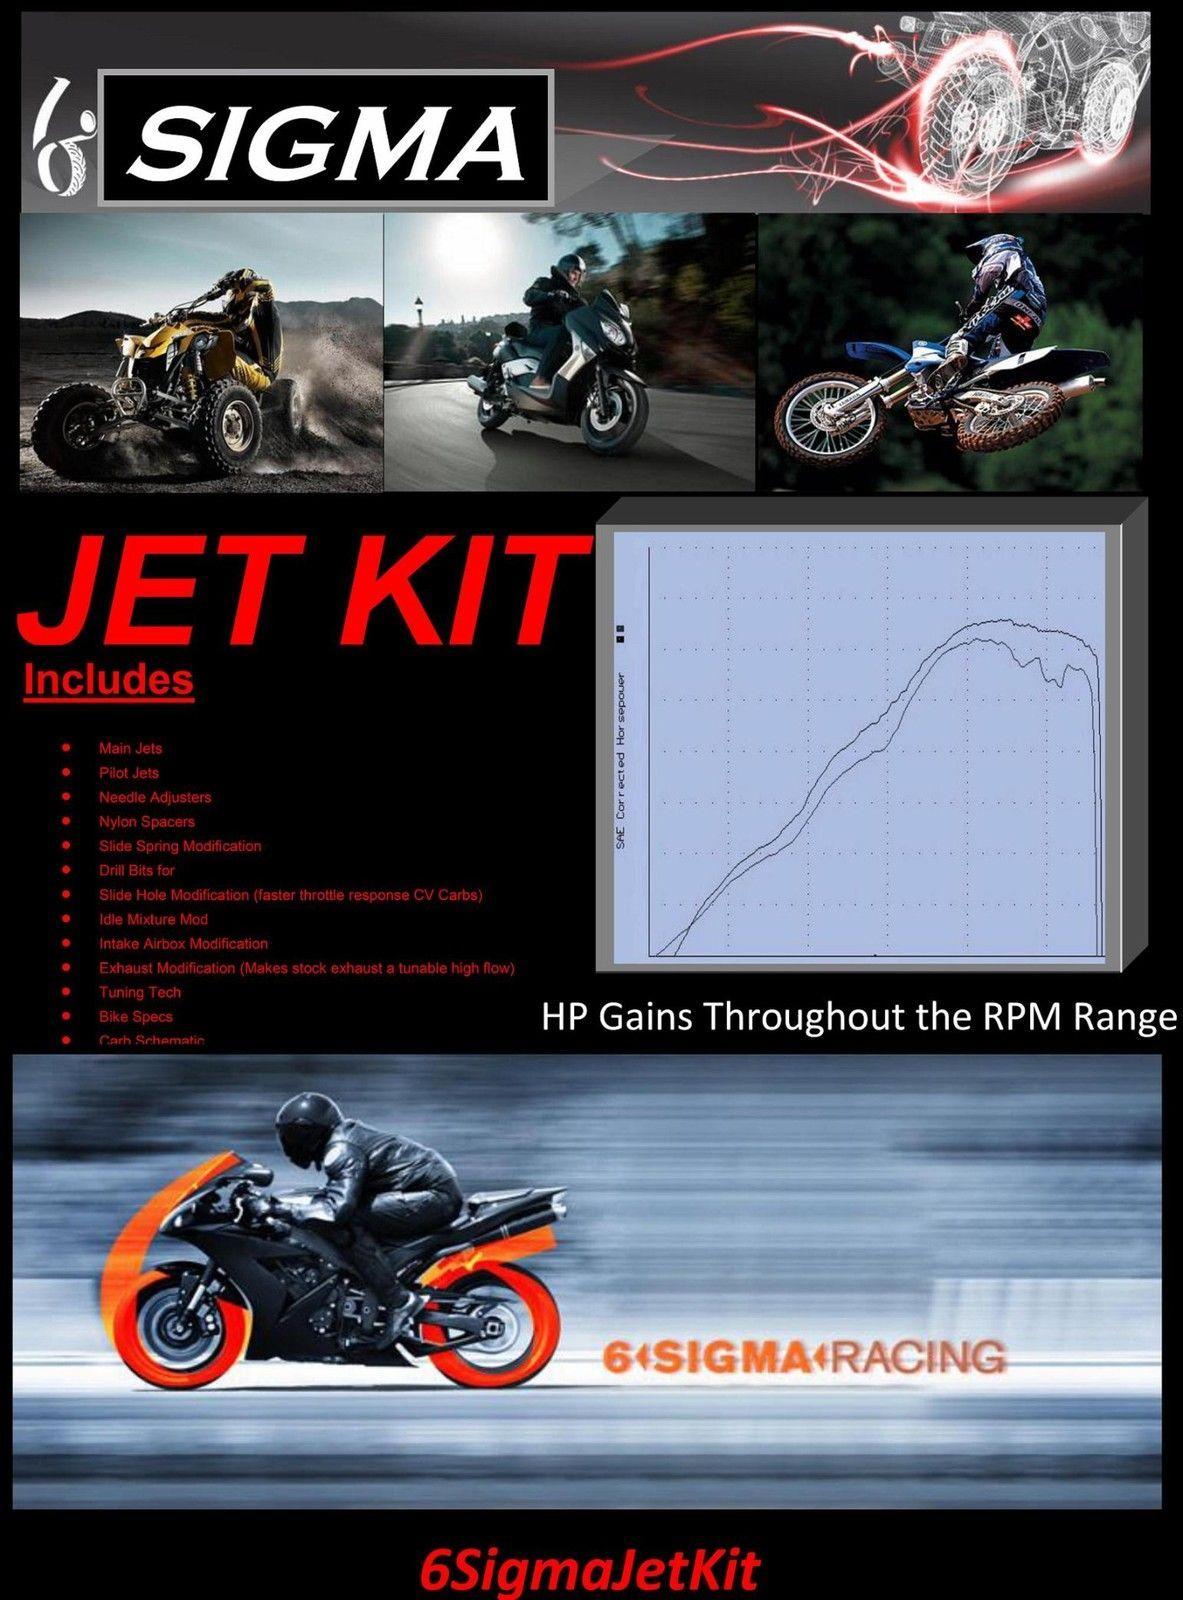 Kawasaki GT550 GT 550 cc  6 Sigma Custom Carburetor Carb Stage 1-3 Jet Kit